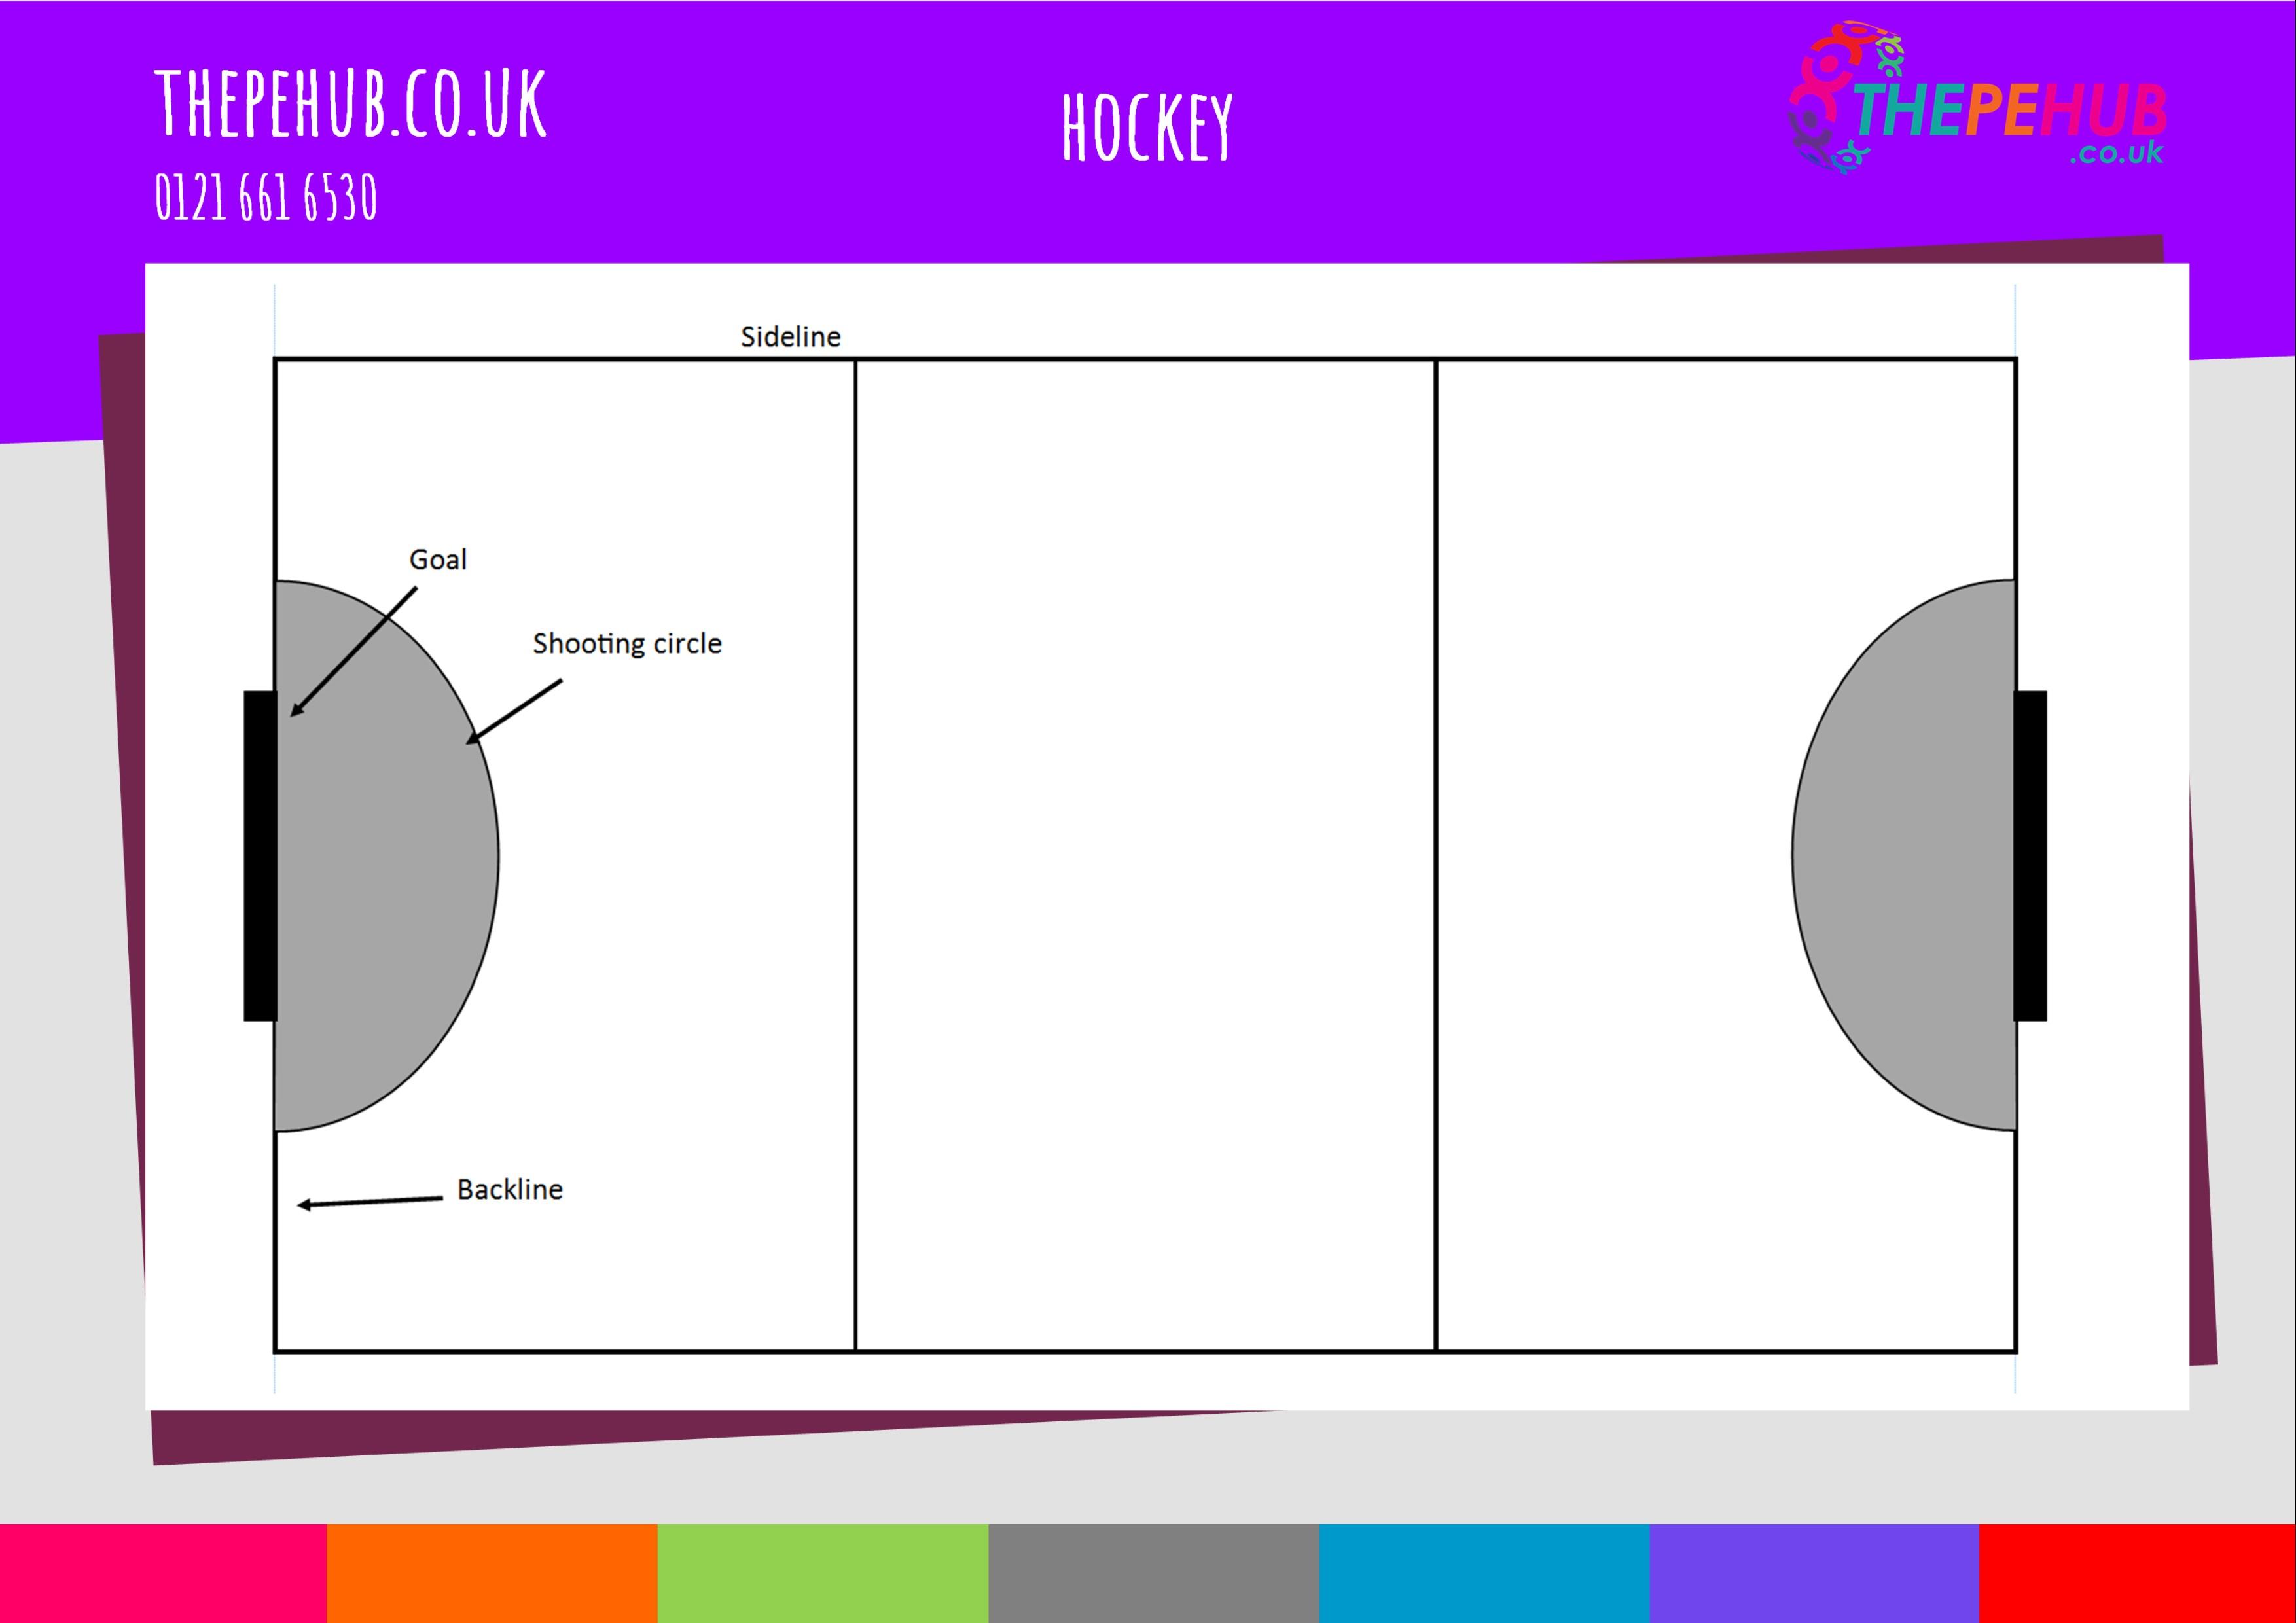 School games hockey pitch layout